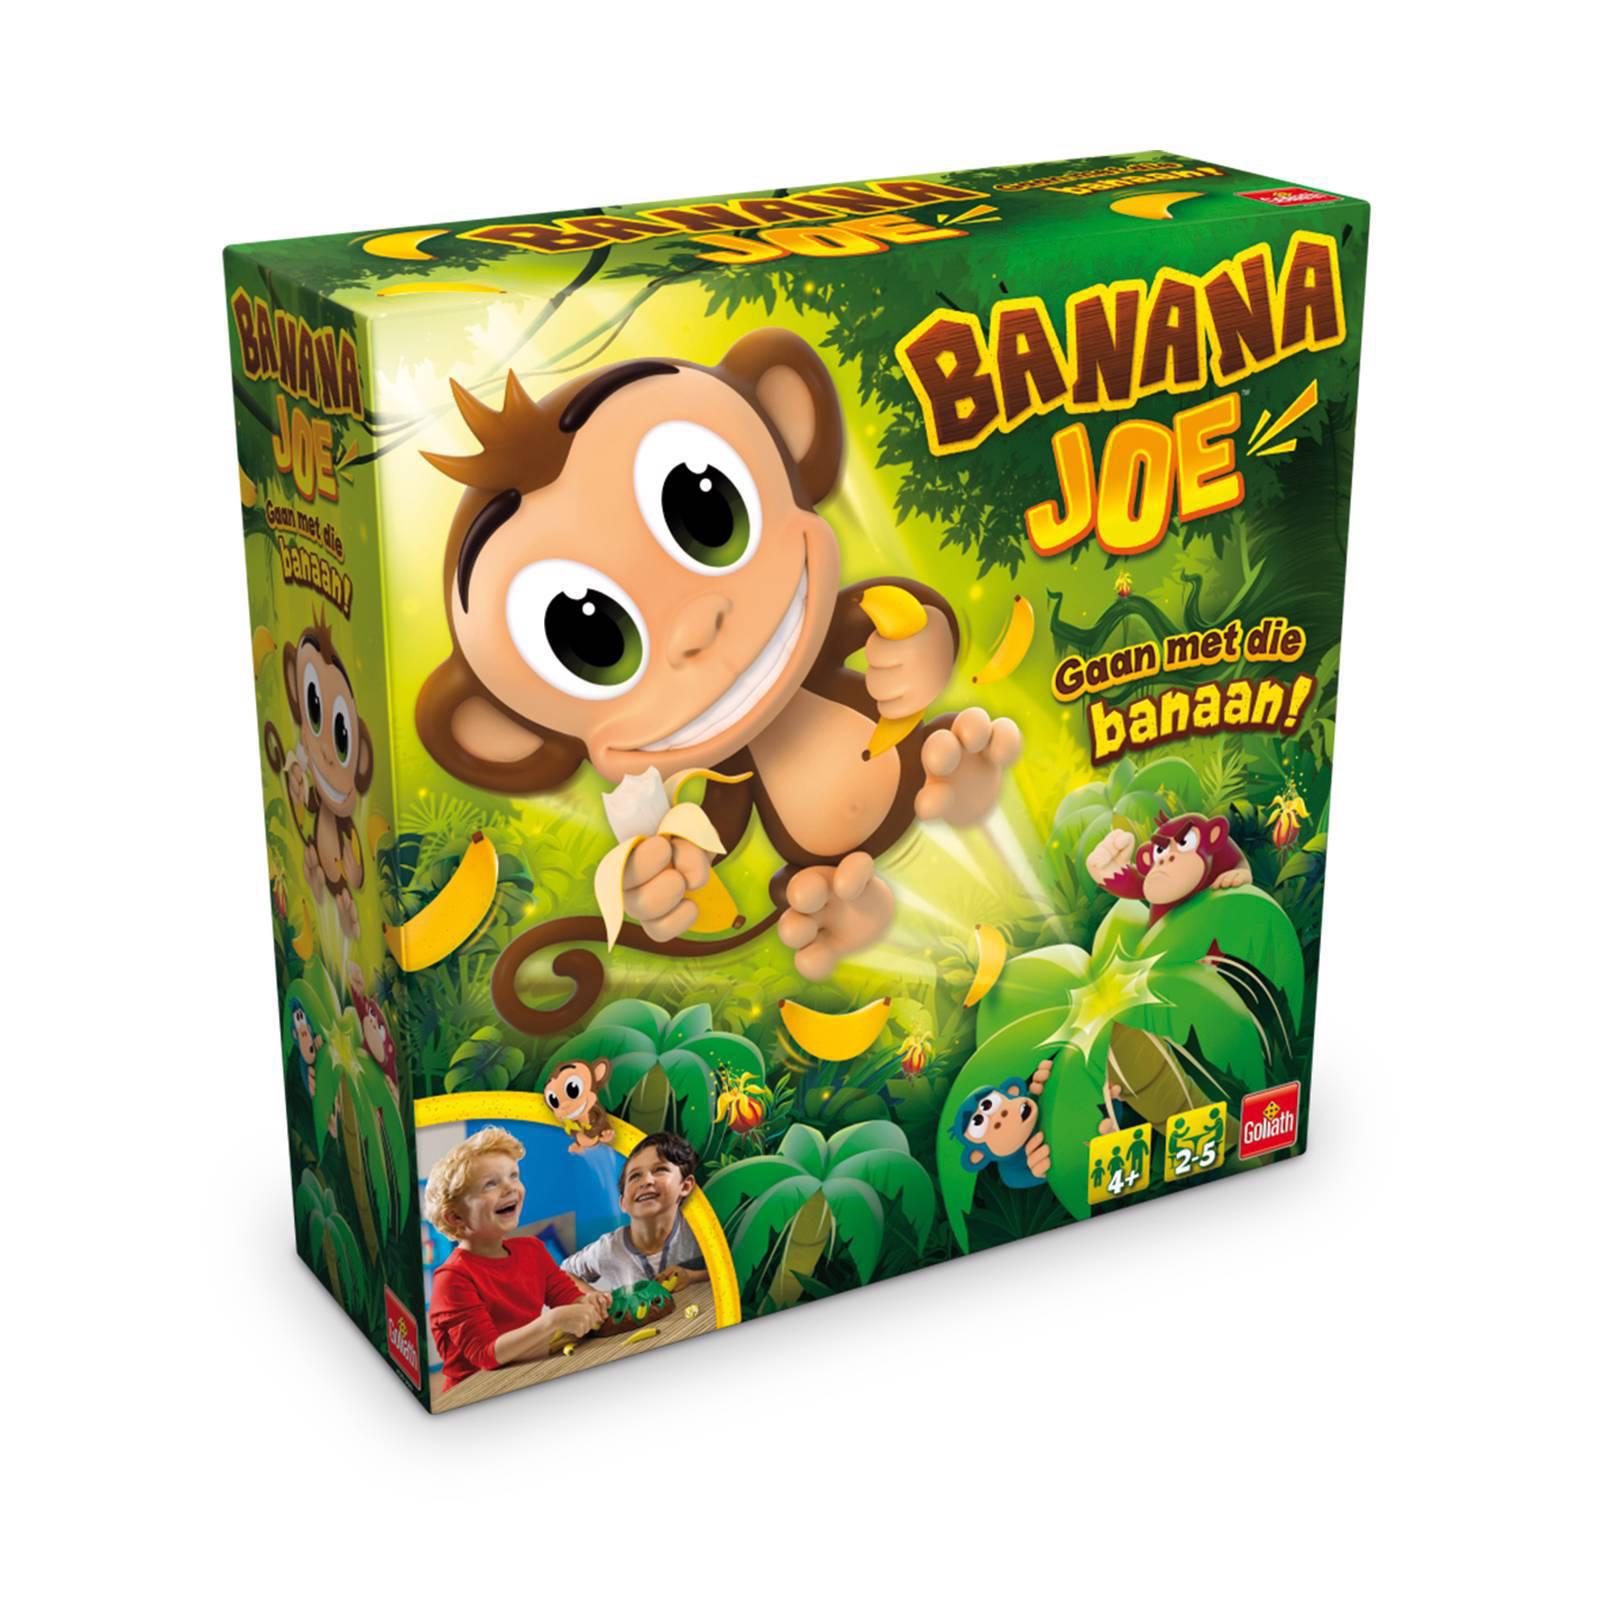 Mr Krab Goliath Spellen en speelgoed :Goliath – Spellen